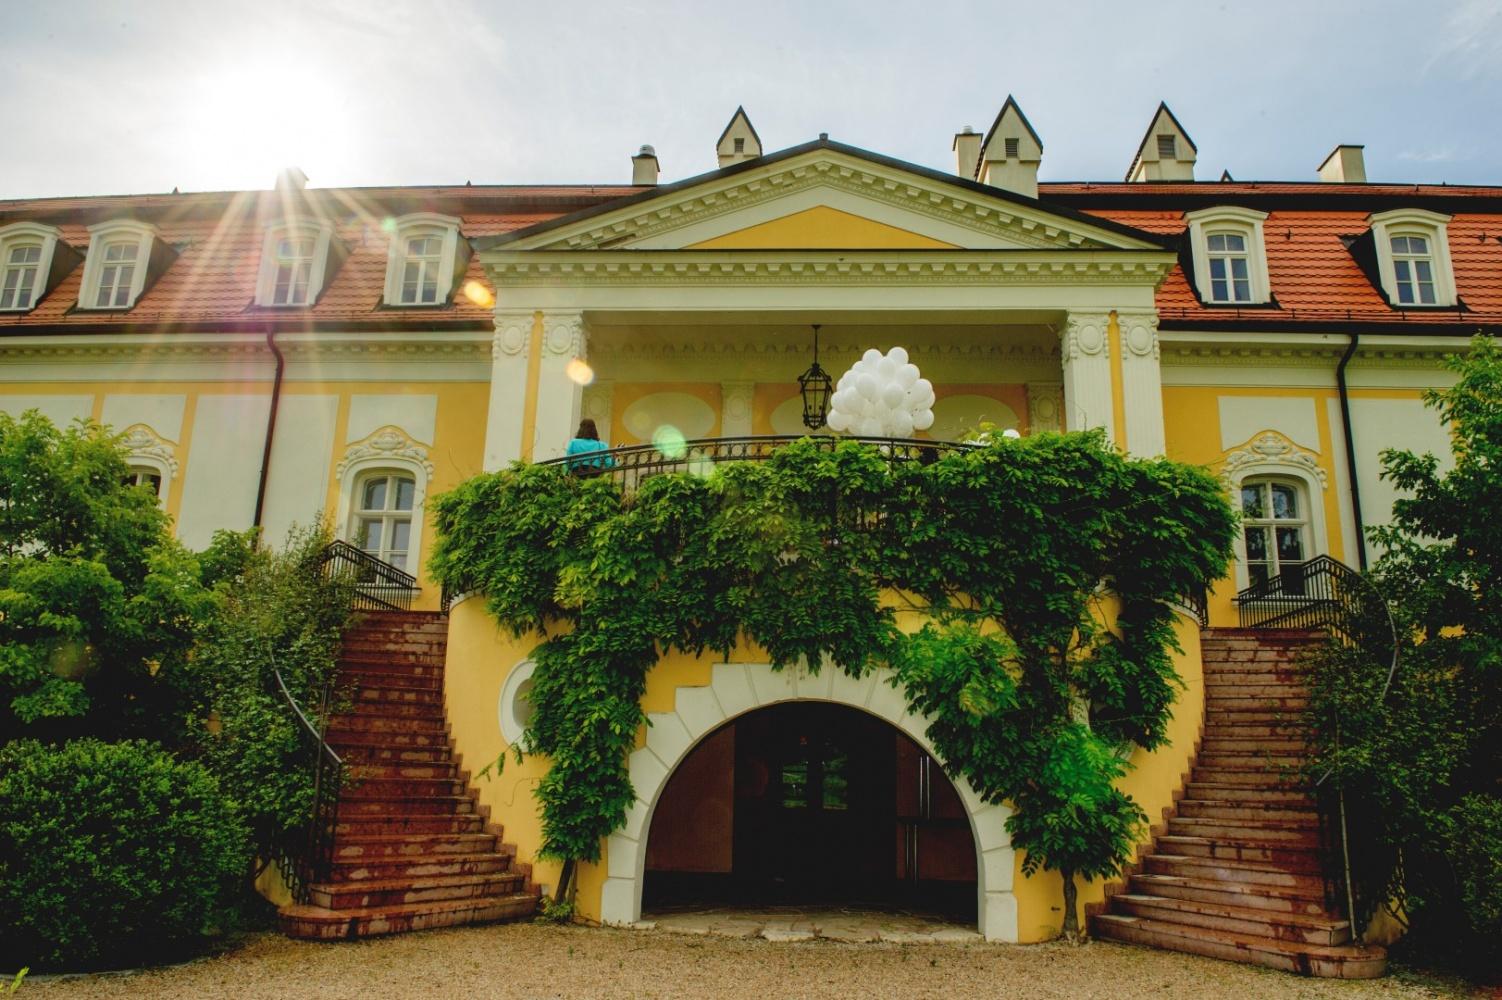 http://www.fotoz.sk/images/gallery-26/normal/svadba_hotel-chateau-bela_099.jpg